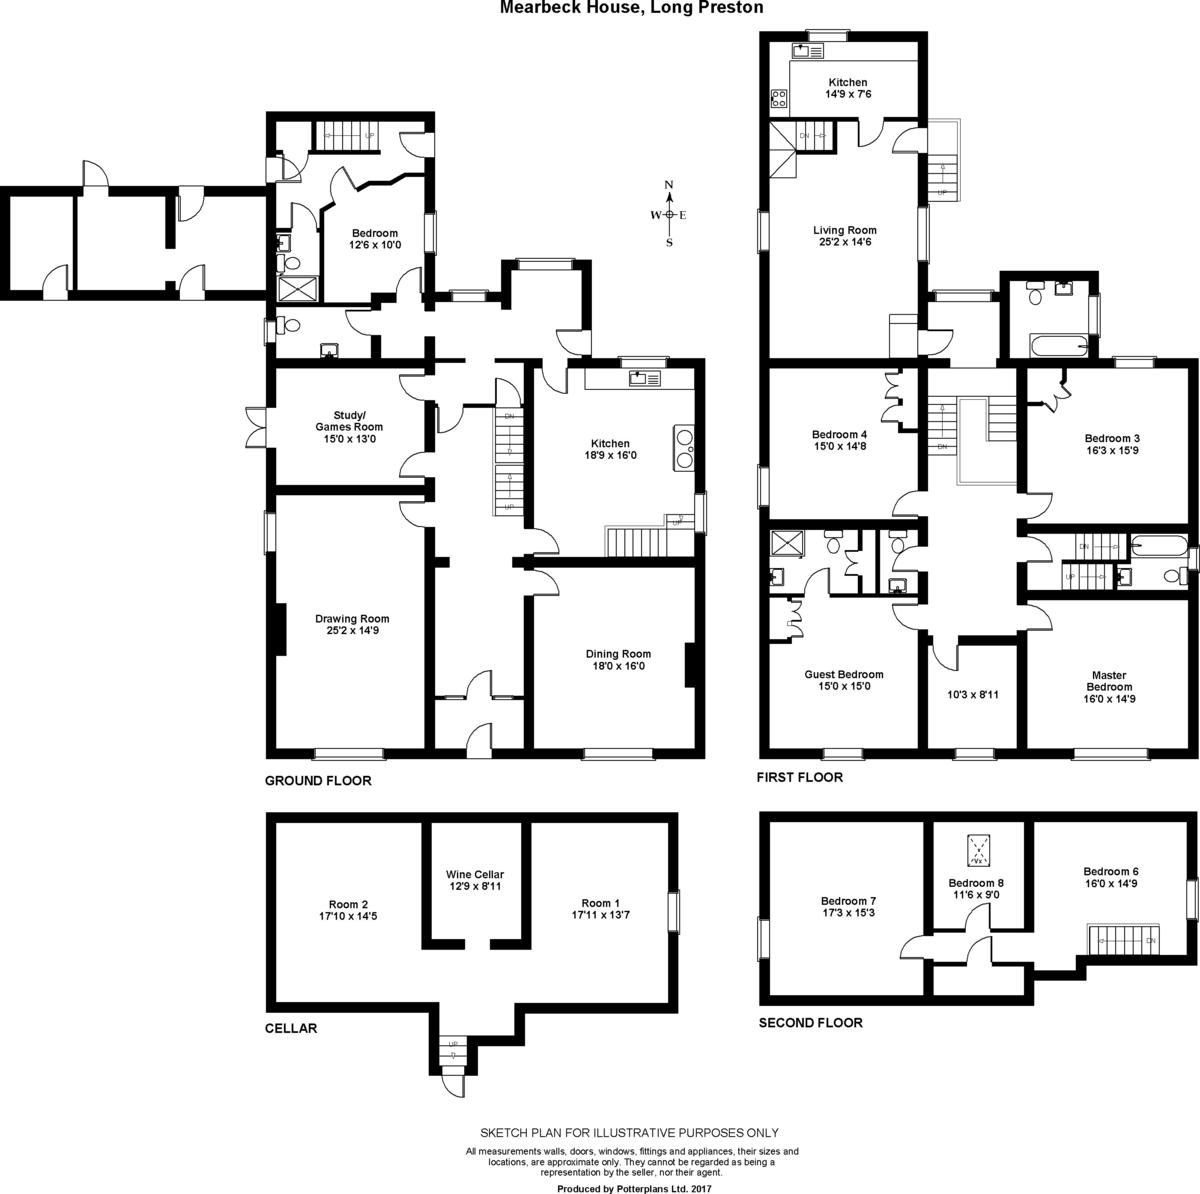 Mearbeck House, Long Preston Floorplan